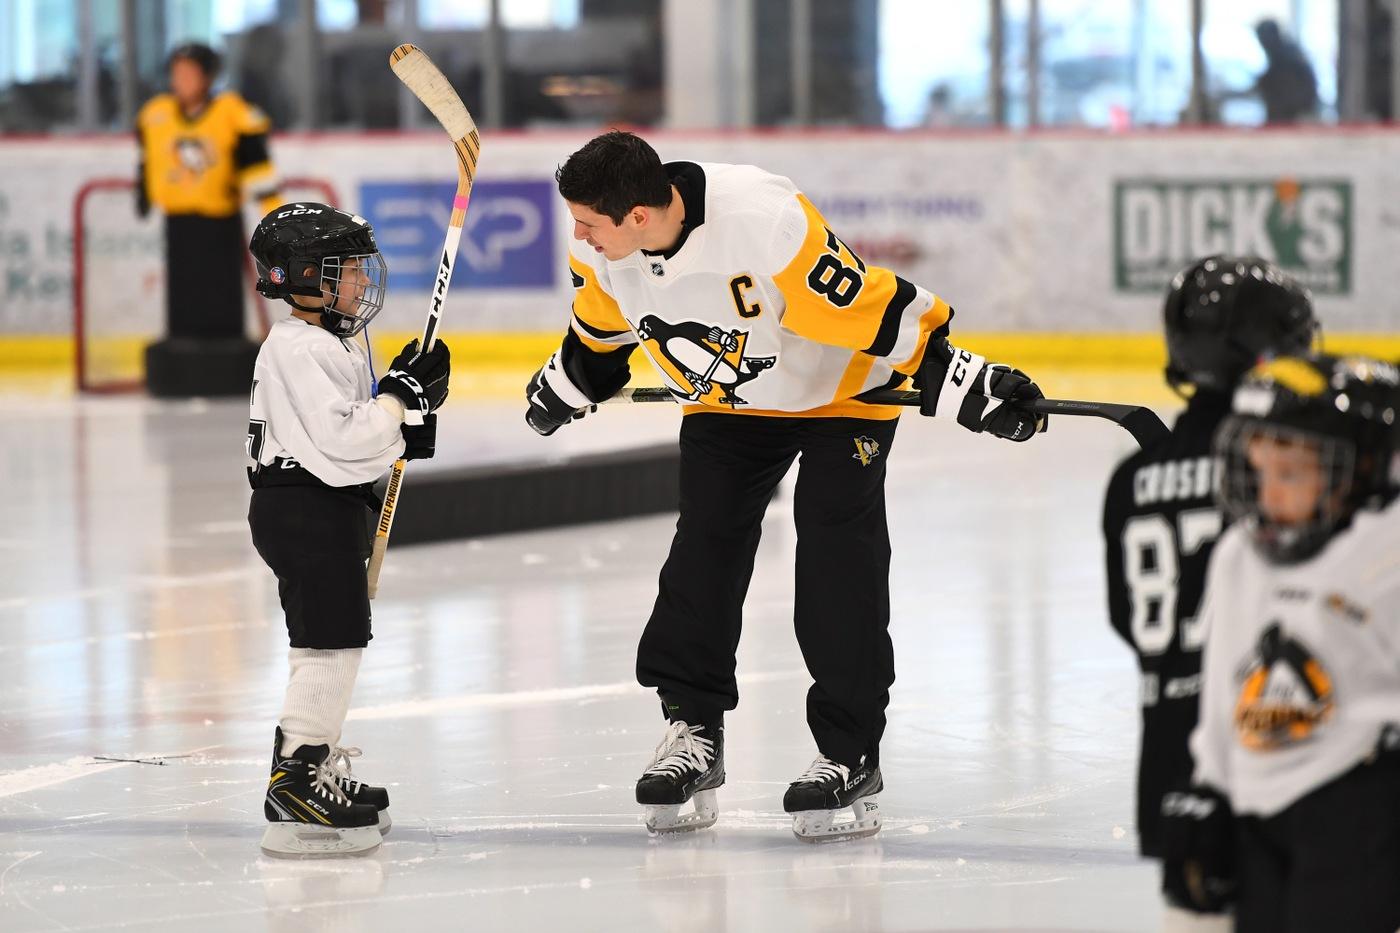 FBI Pittsburgh 2019 Director's Community Leadership Award recipient the Pittsburgh Penguins Foundation.